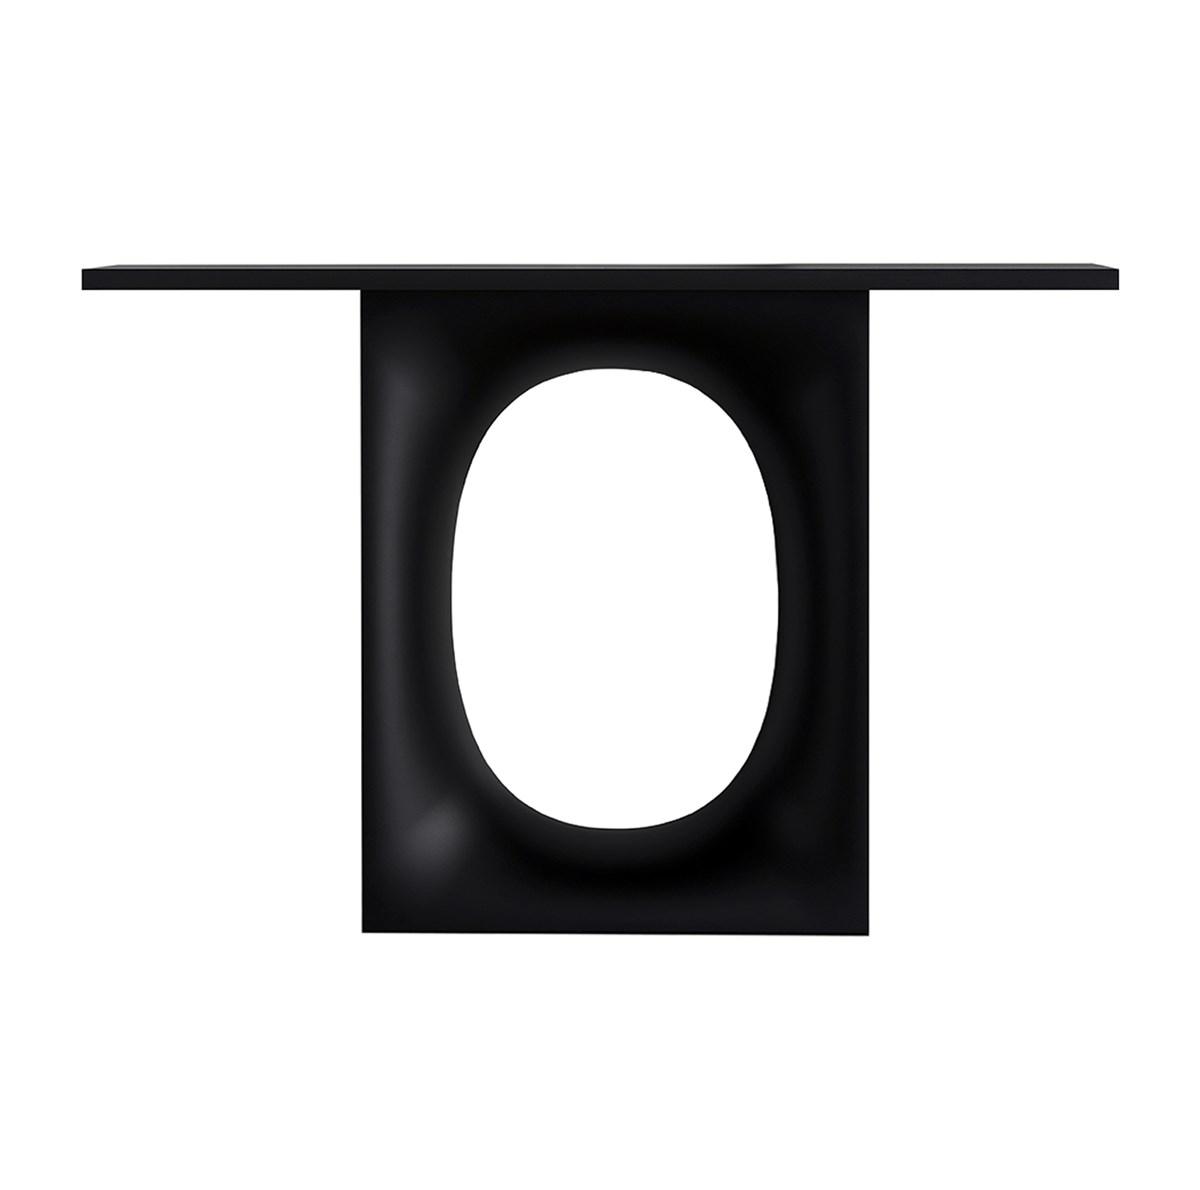 Kristalia-Kensaku-Oshiro-Holo-Console-Matisse-1